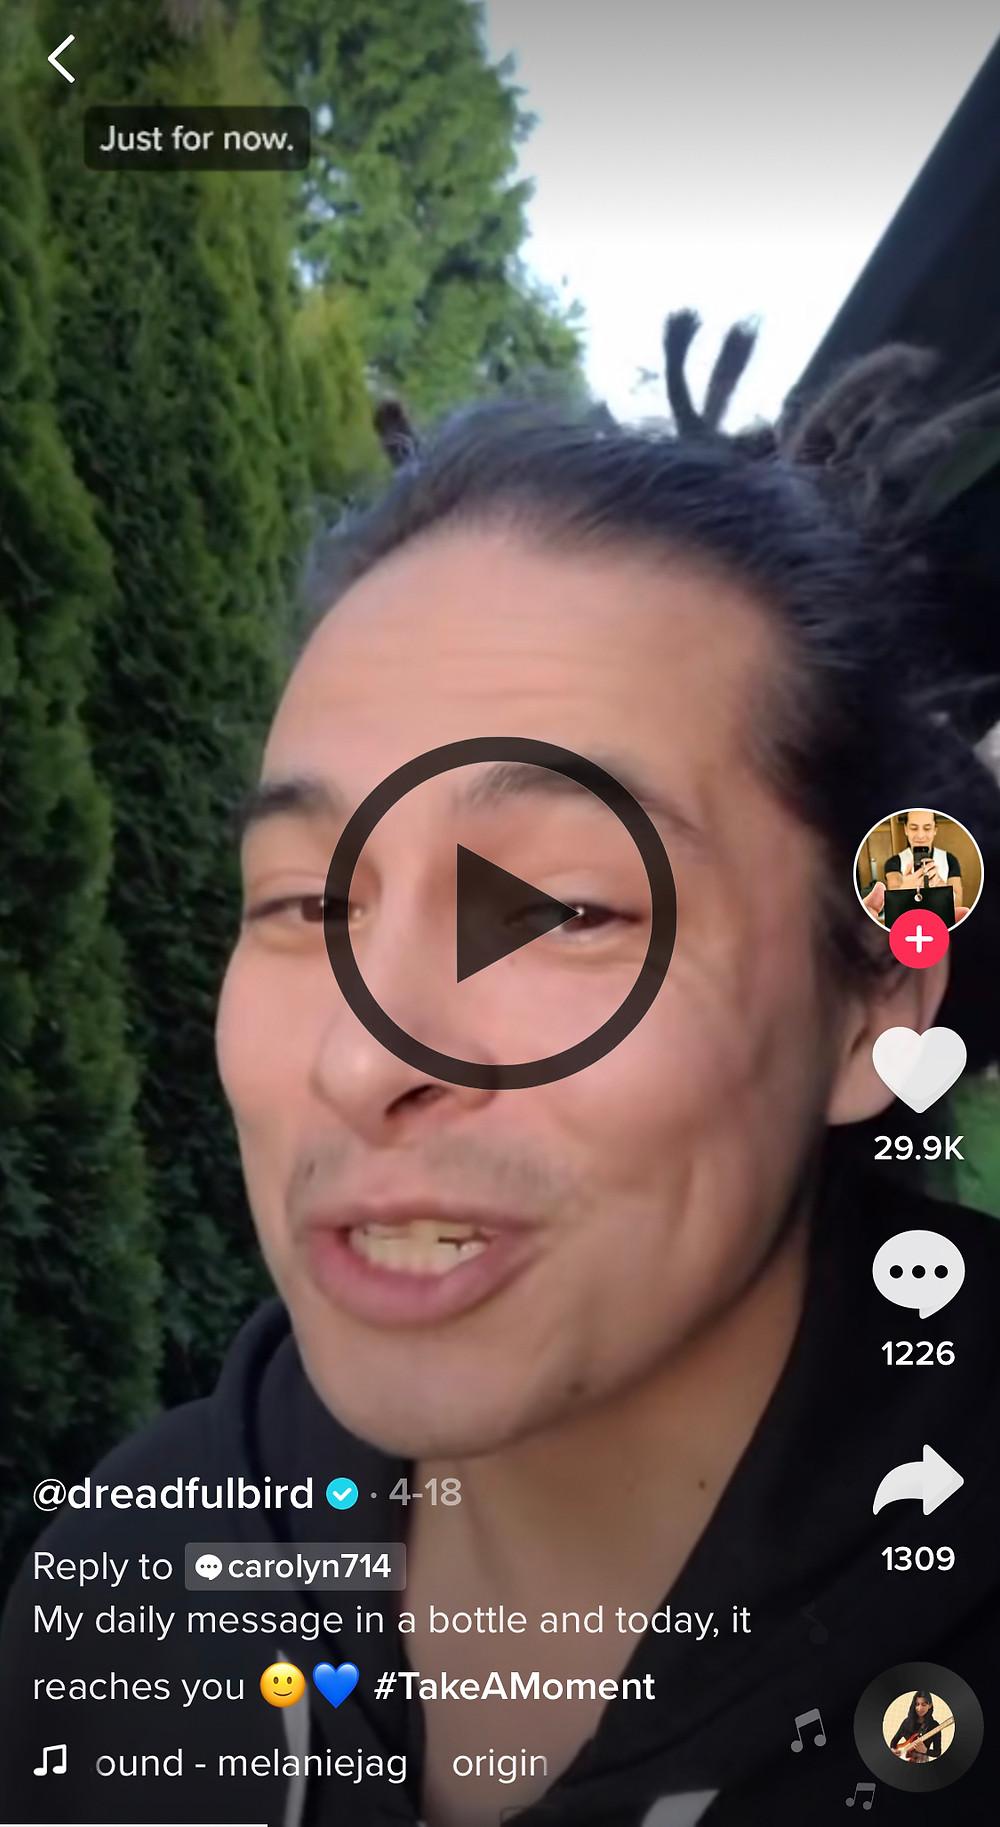 A screenshot of a mindfulness TikTok